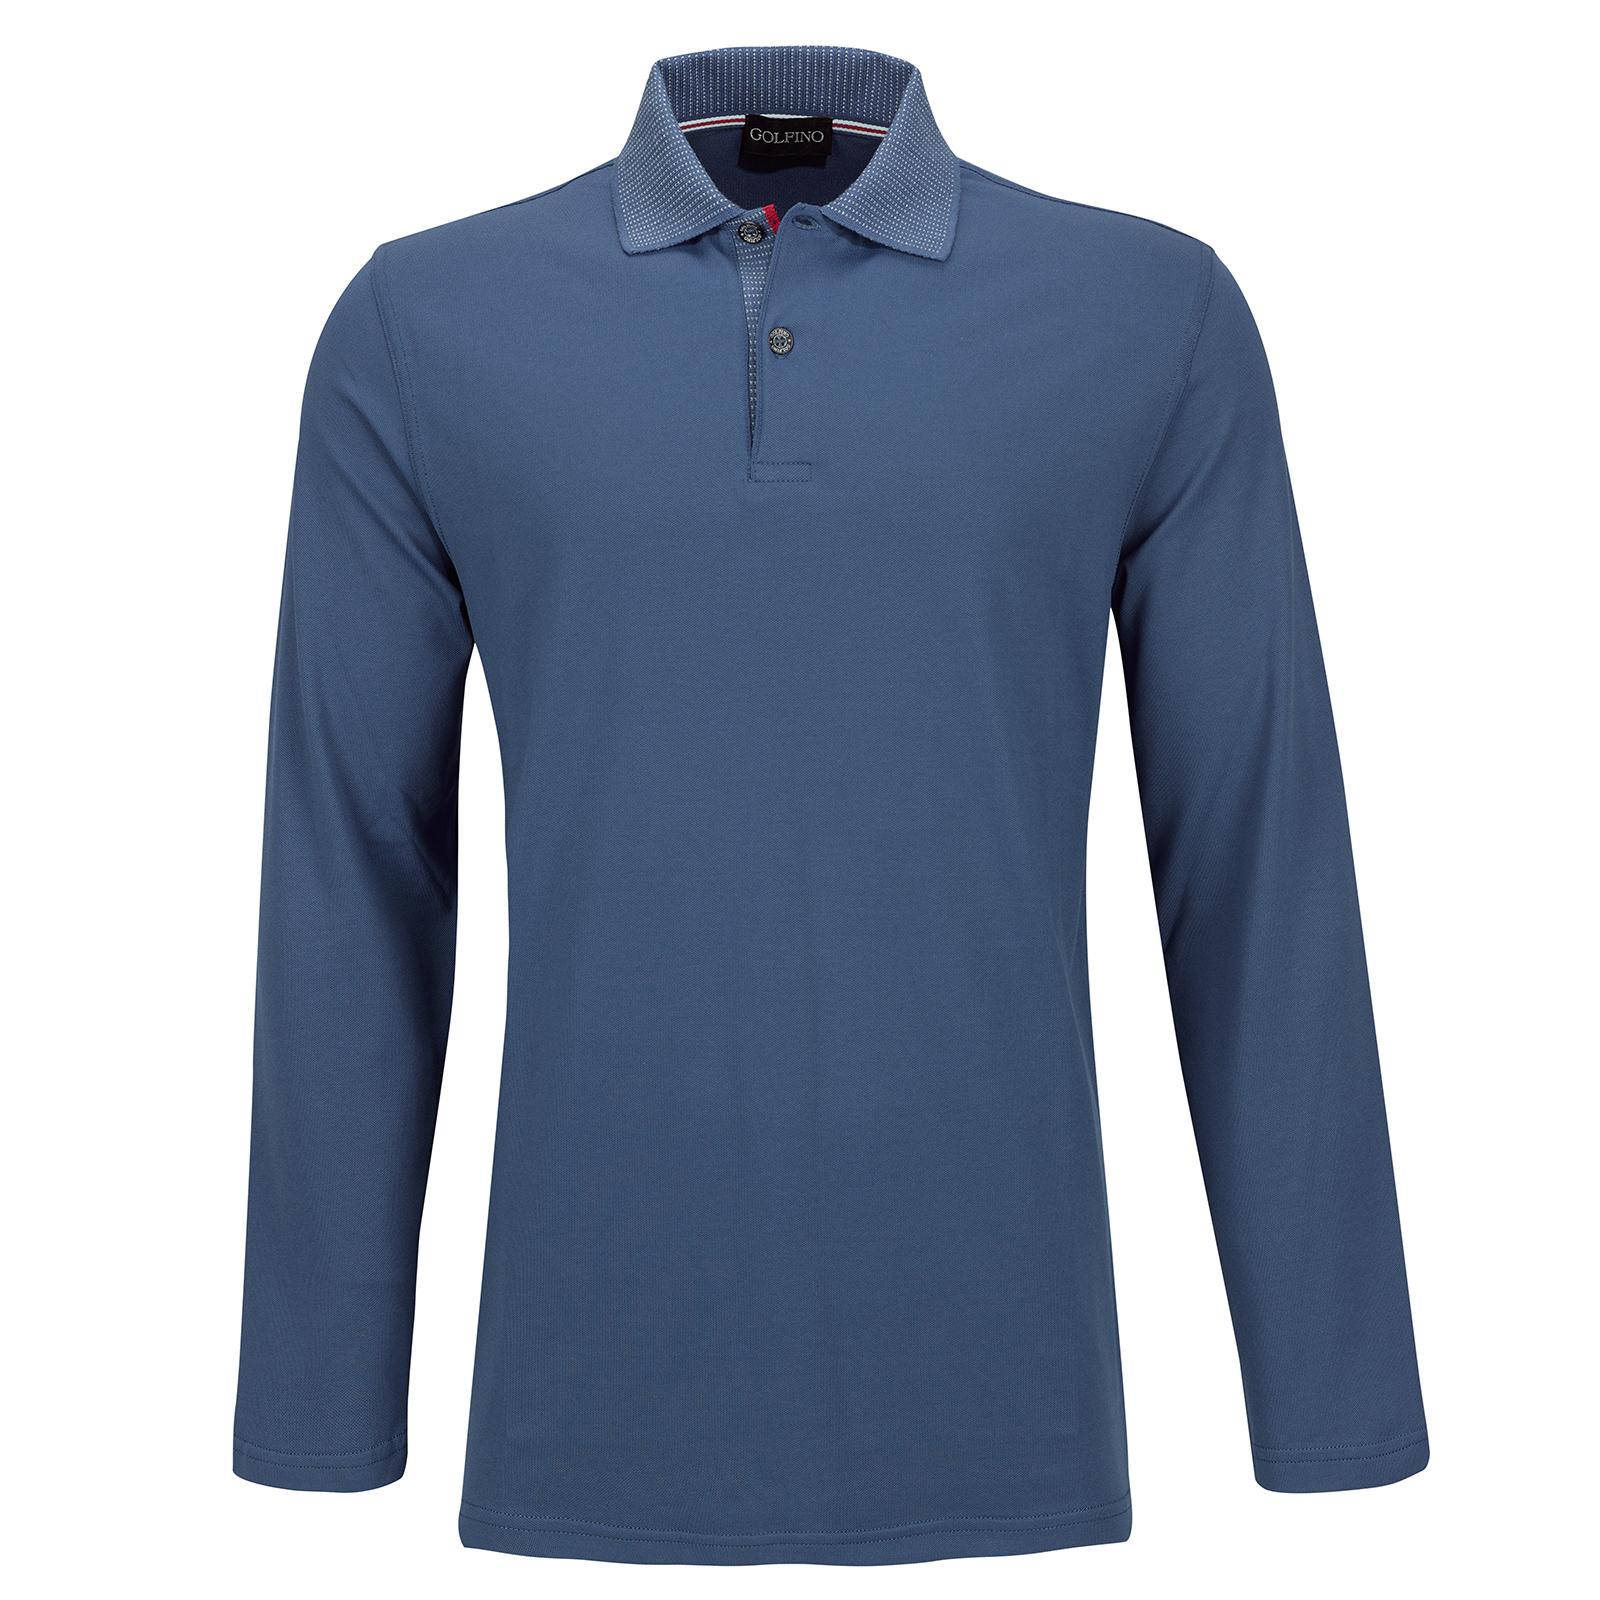 Herren Langarm Stretch-Golfpolohemd mit Sun Protection